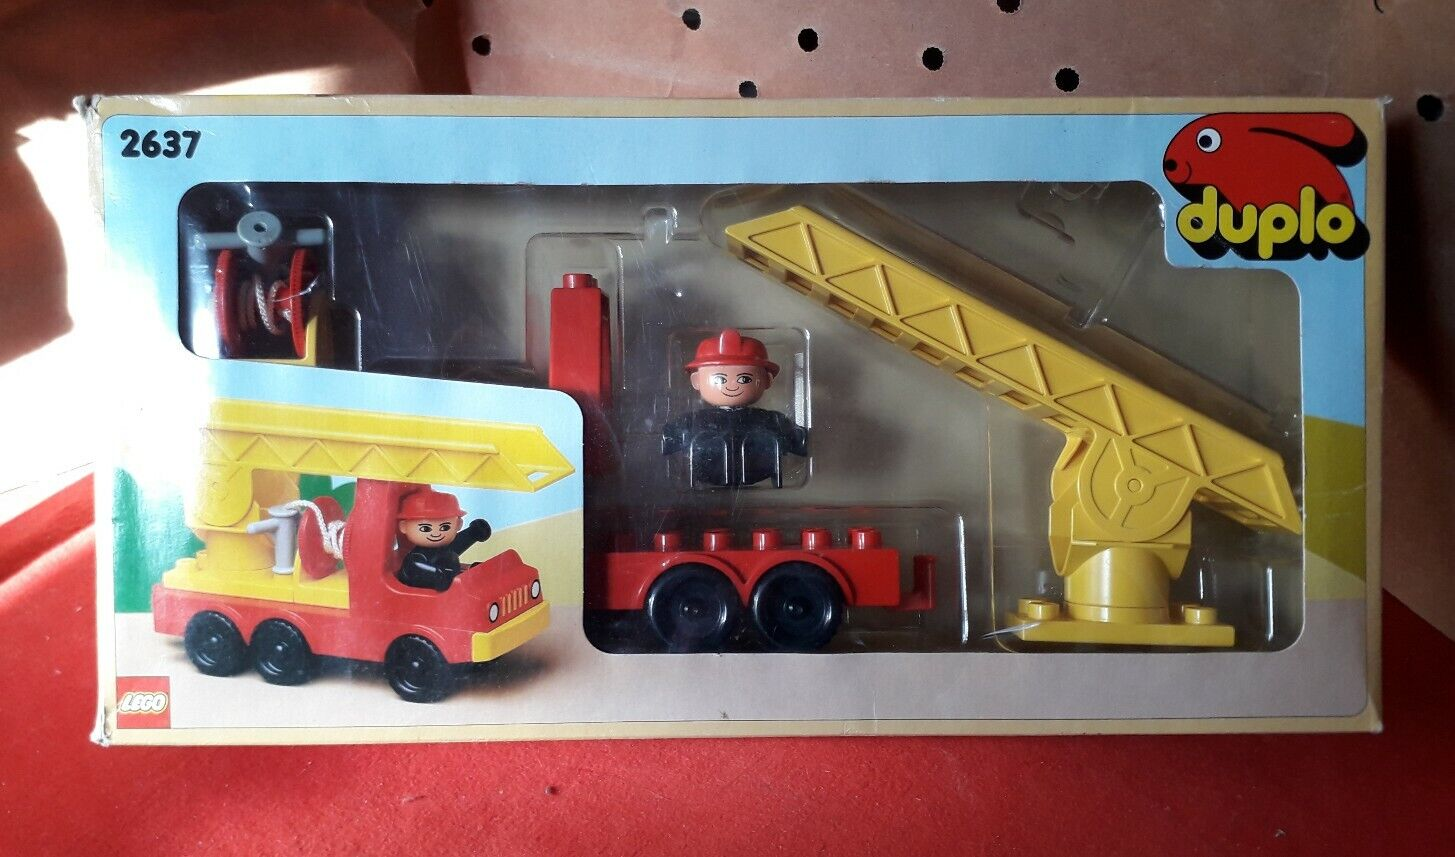 Lego Duplo 2637 Fire Engine - completo 100%